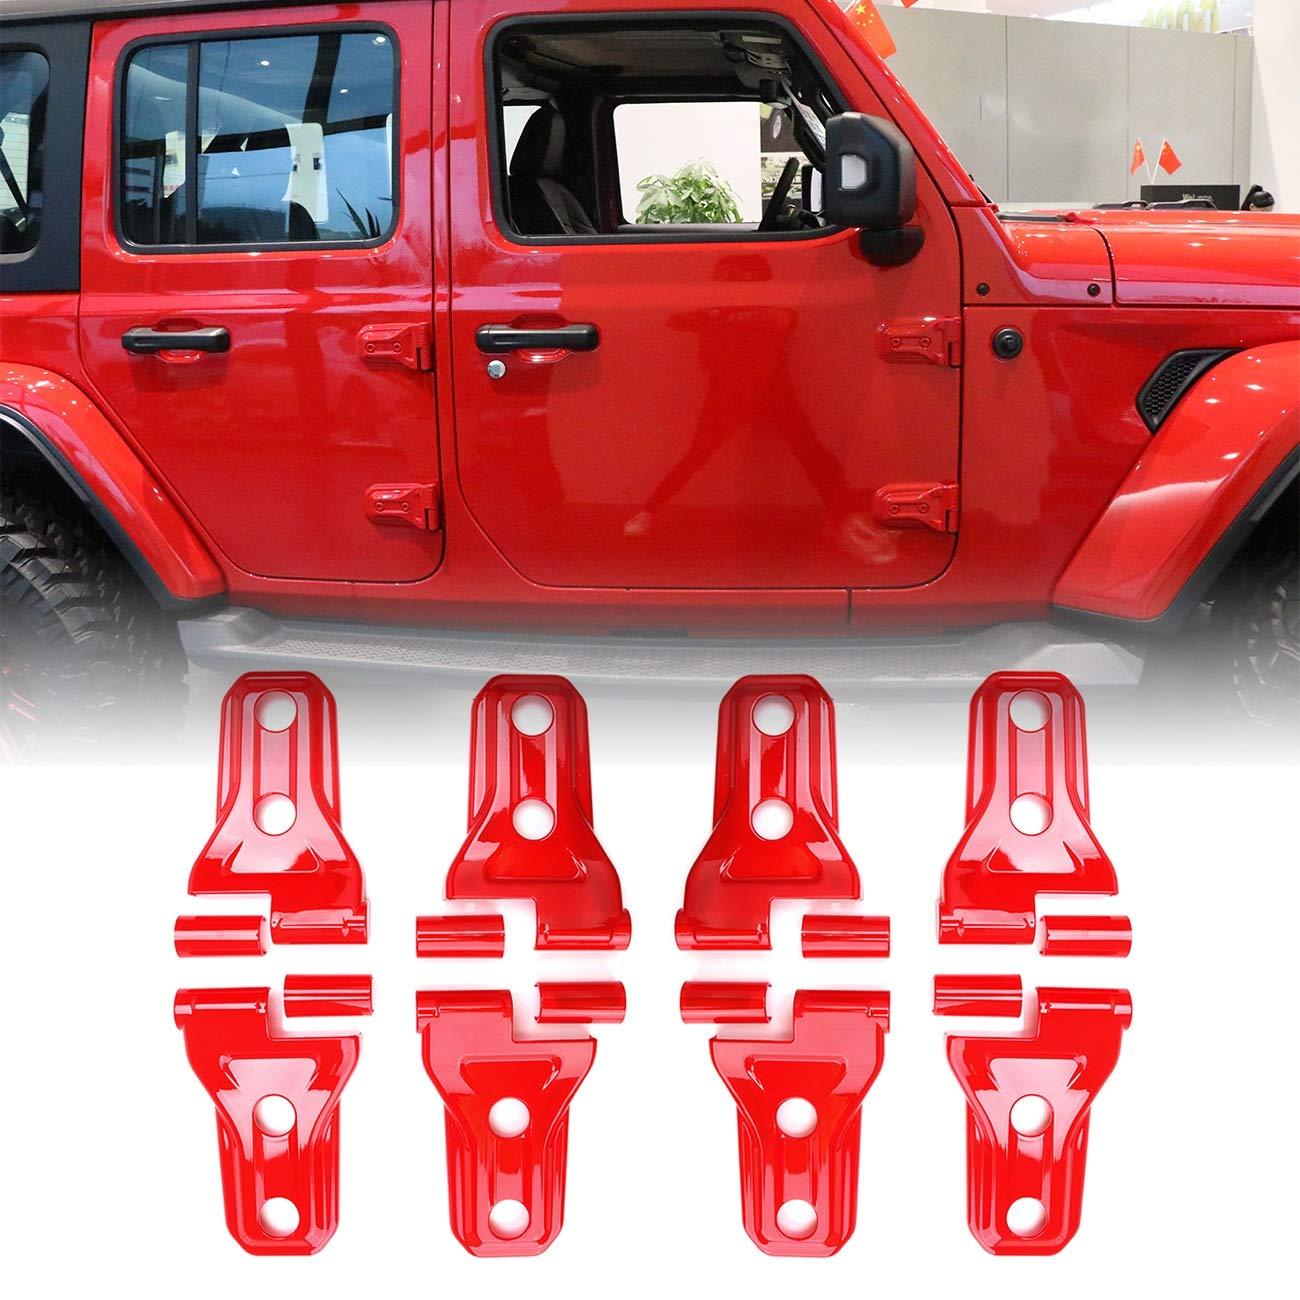 4 Pieces Triple Strap Roll Bar Grab Grip Handles Black for Jeep Wrangler YJ TJ JK JKU 1987-2017